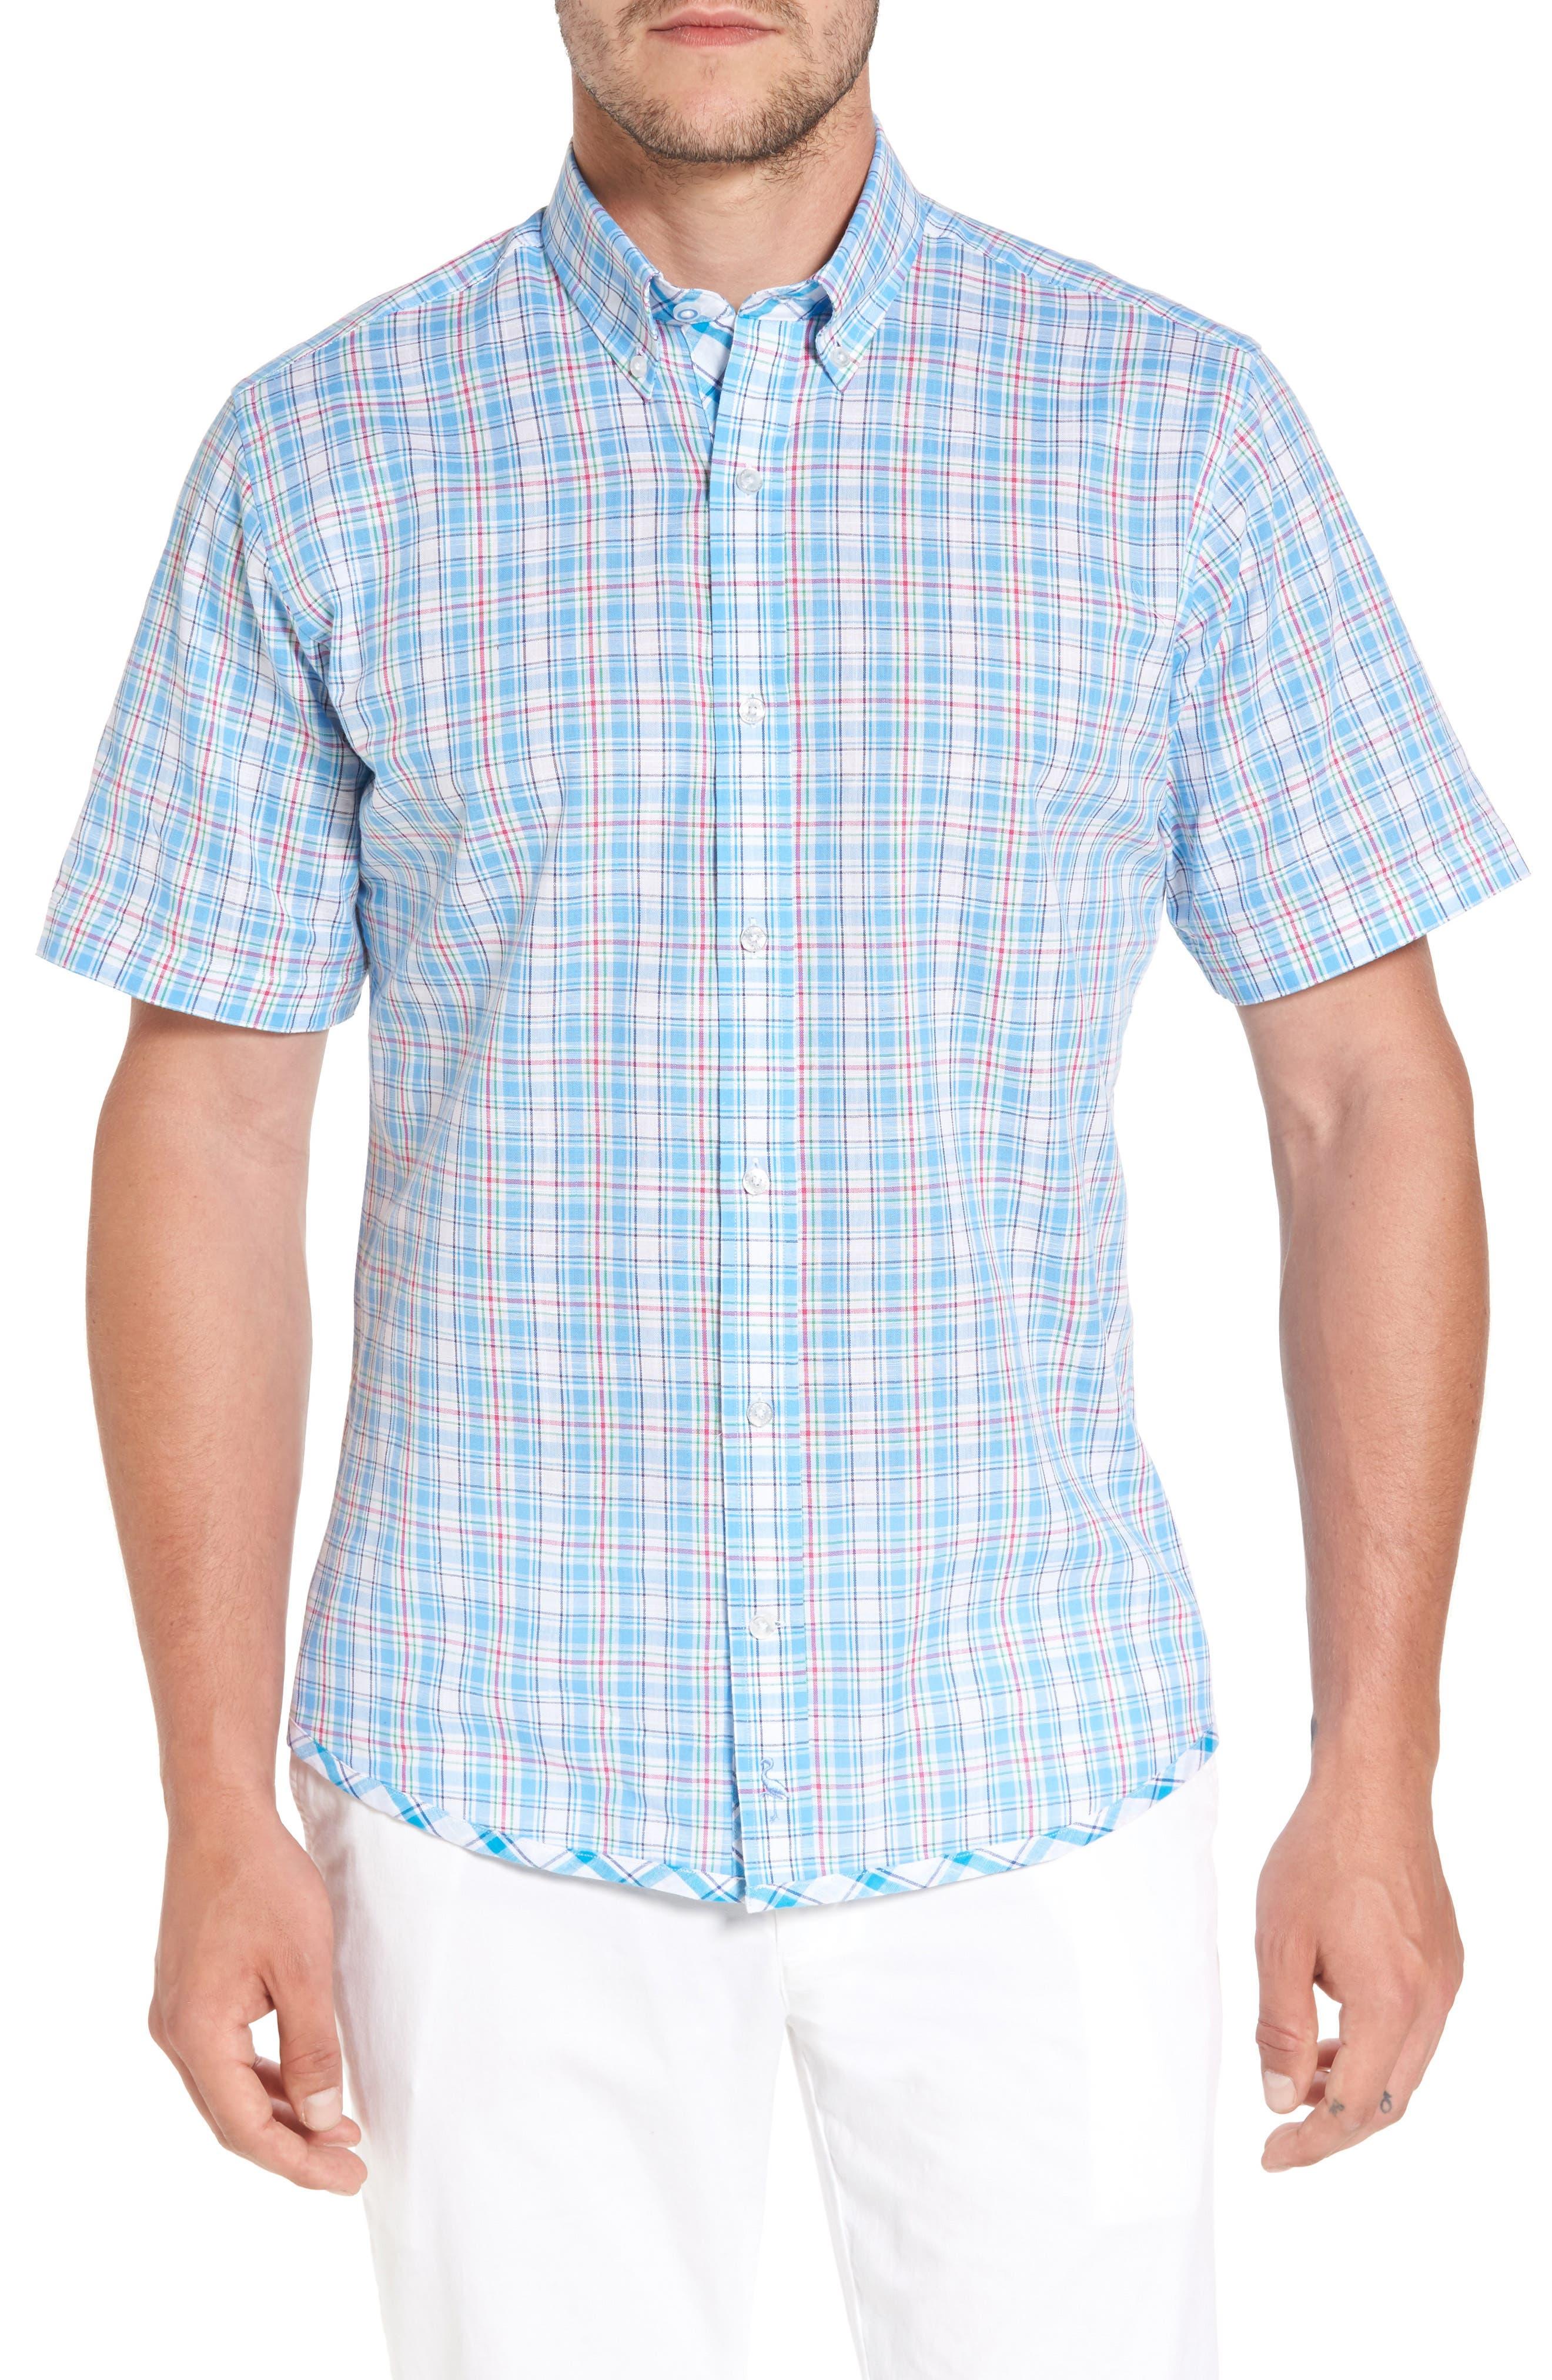 TailorByrd Nectarine Sport Shirt (Big & Tall)